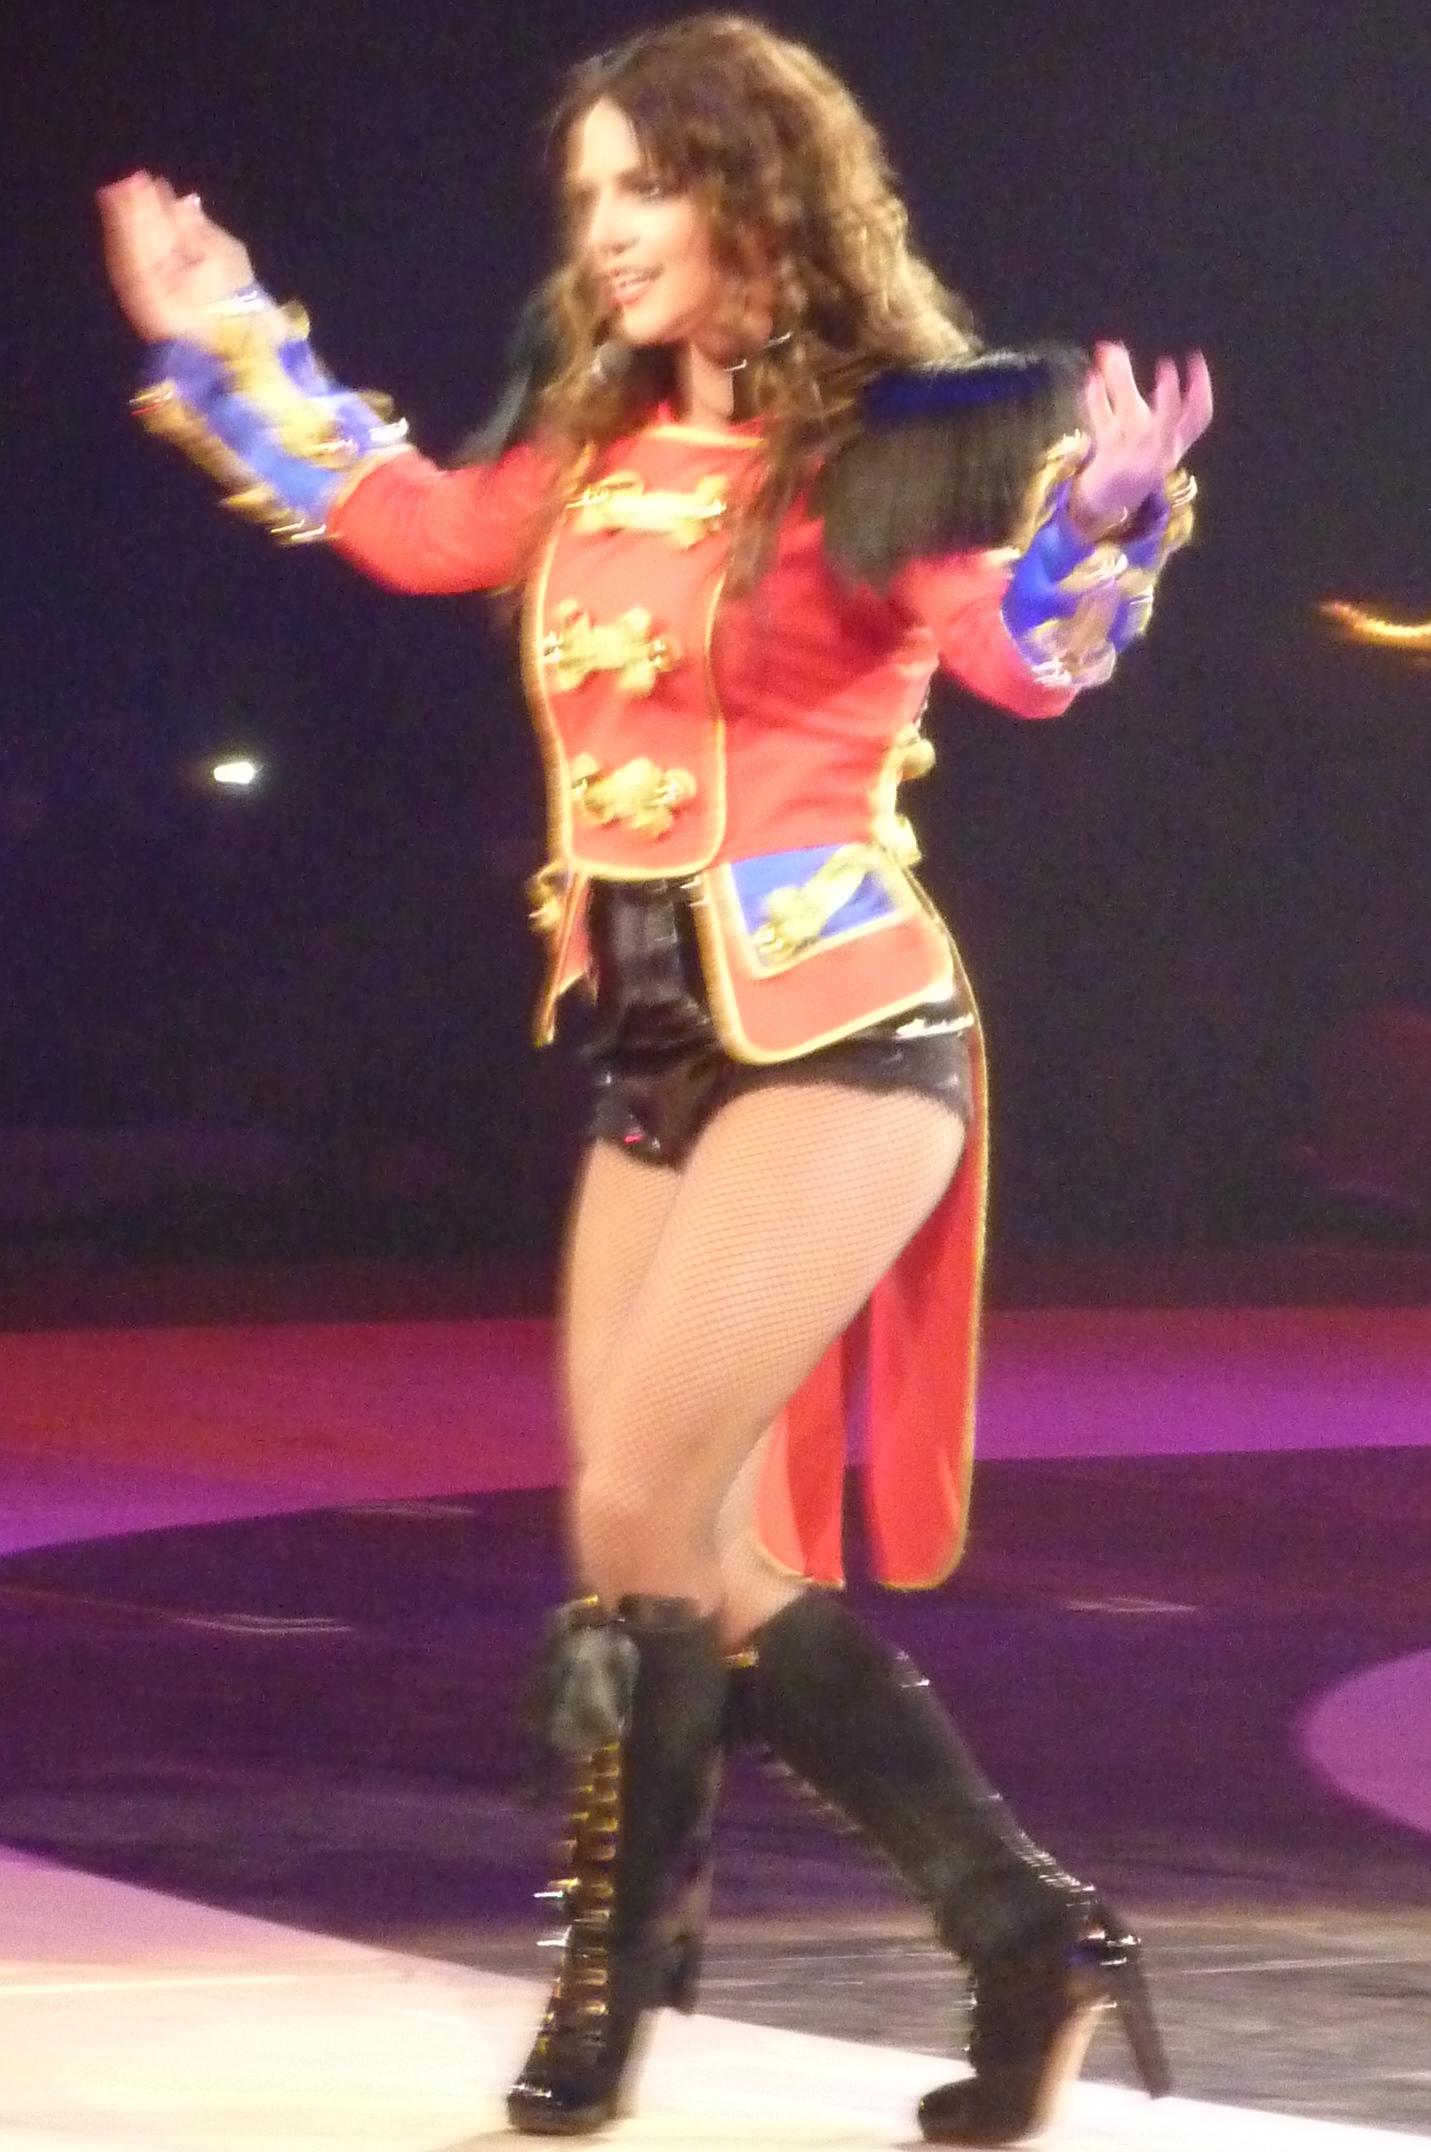 Description Britney Spears Live Paris 1.jpg: commons.wikimedia.org/wiki/File:Britney_Spears_Live_Paris_1.jpg